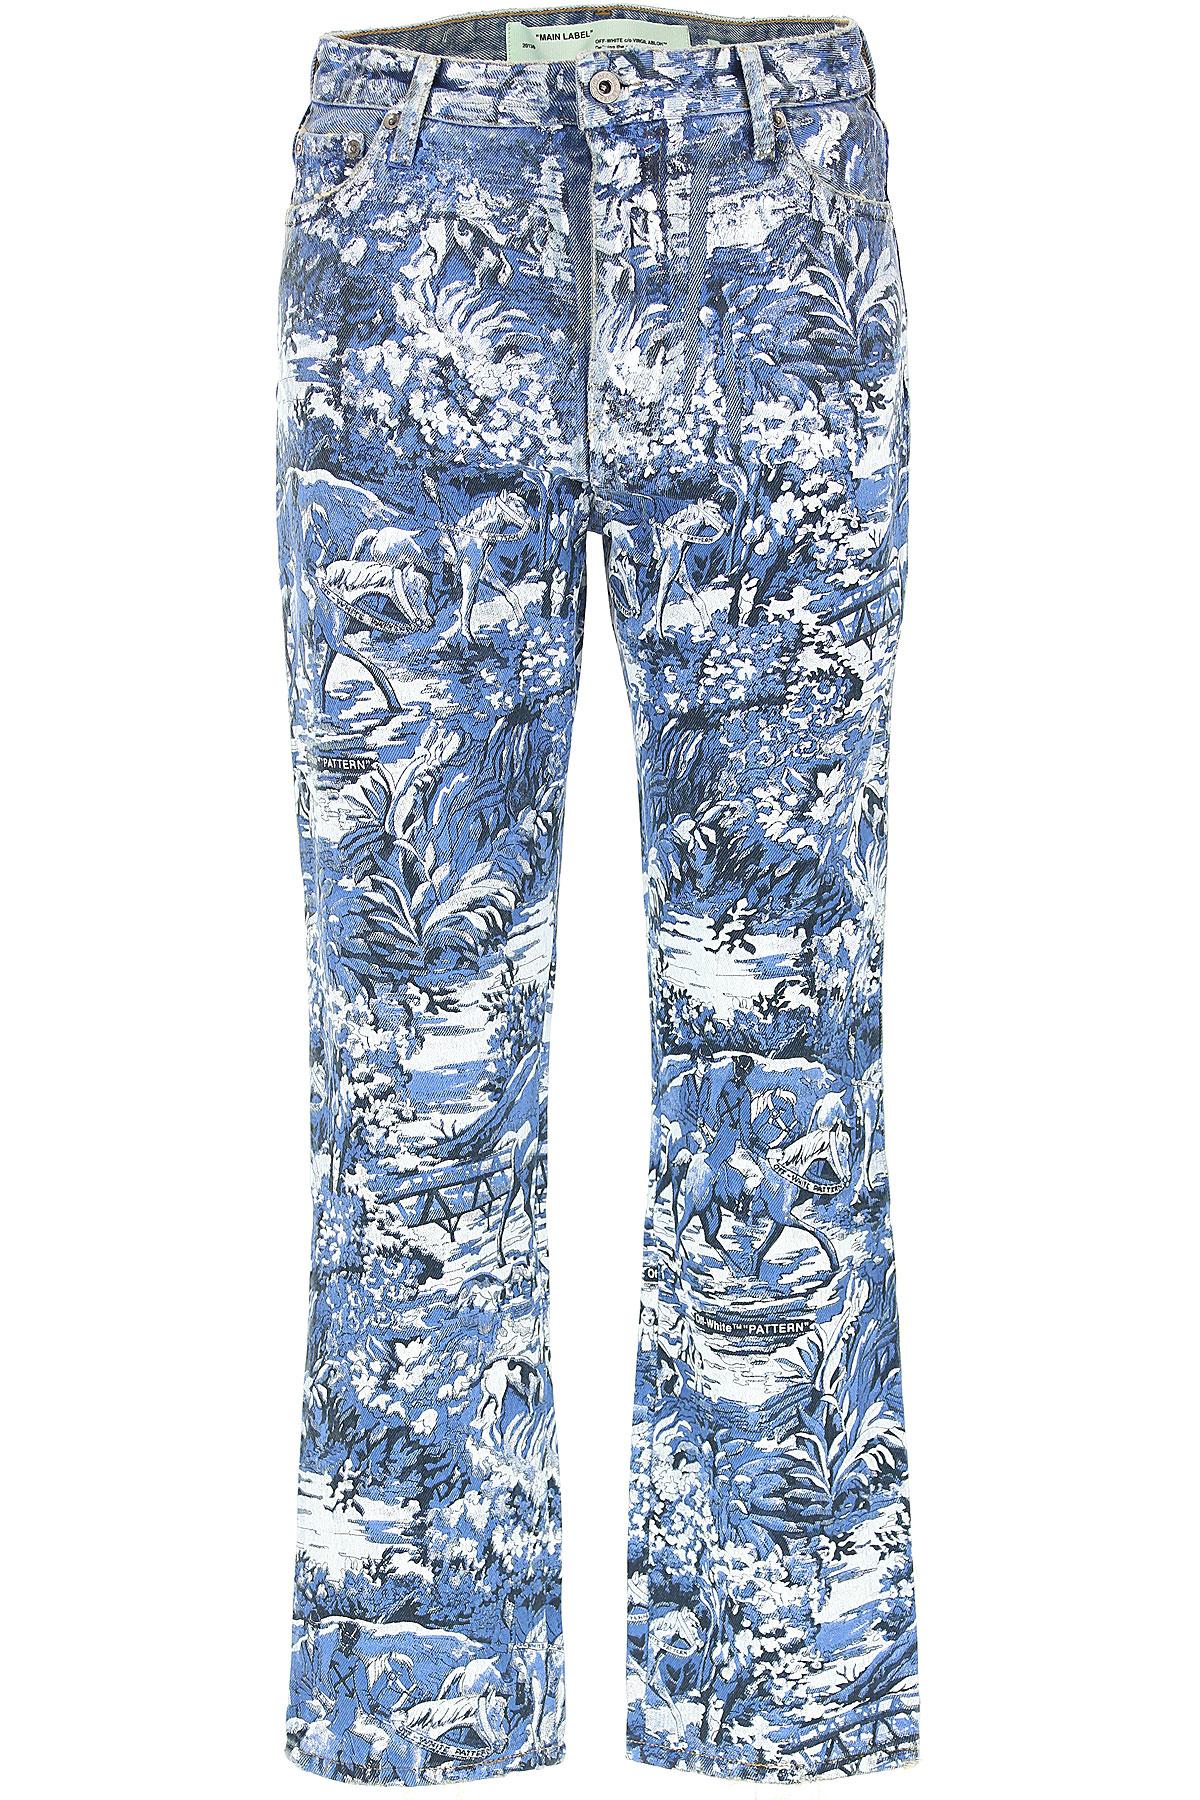 Off-White Virgil Abloh Jeans On Sale, Denim Light Blue, Cotton, 2019, 26 27